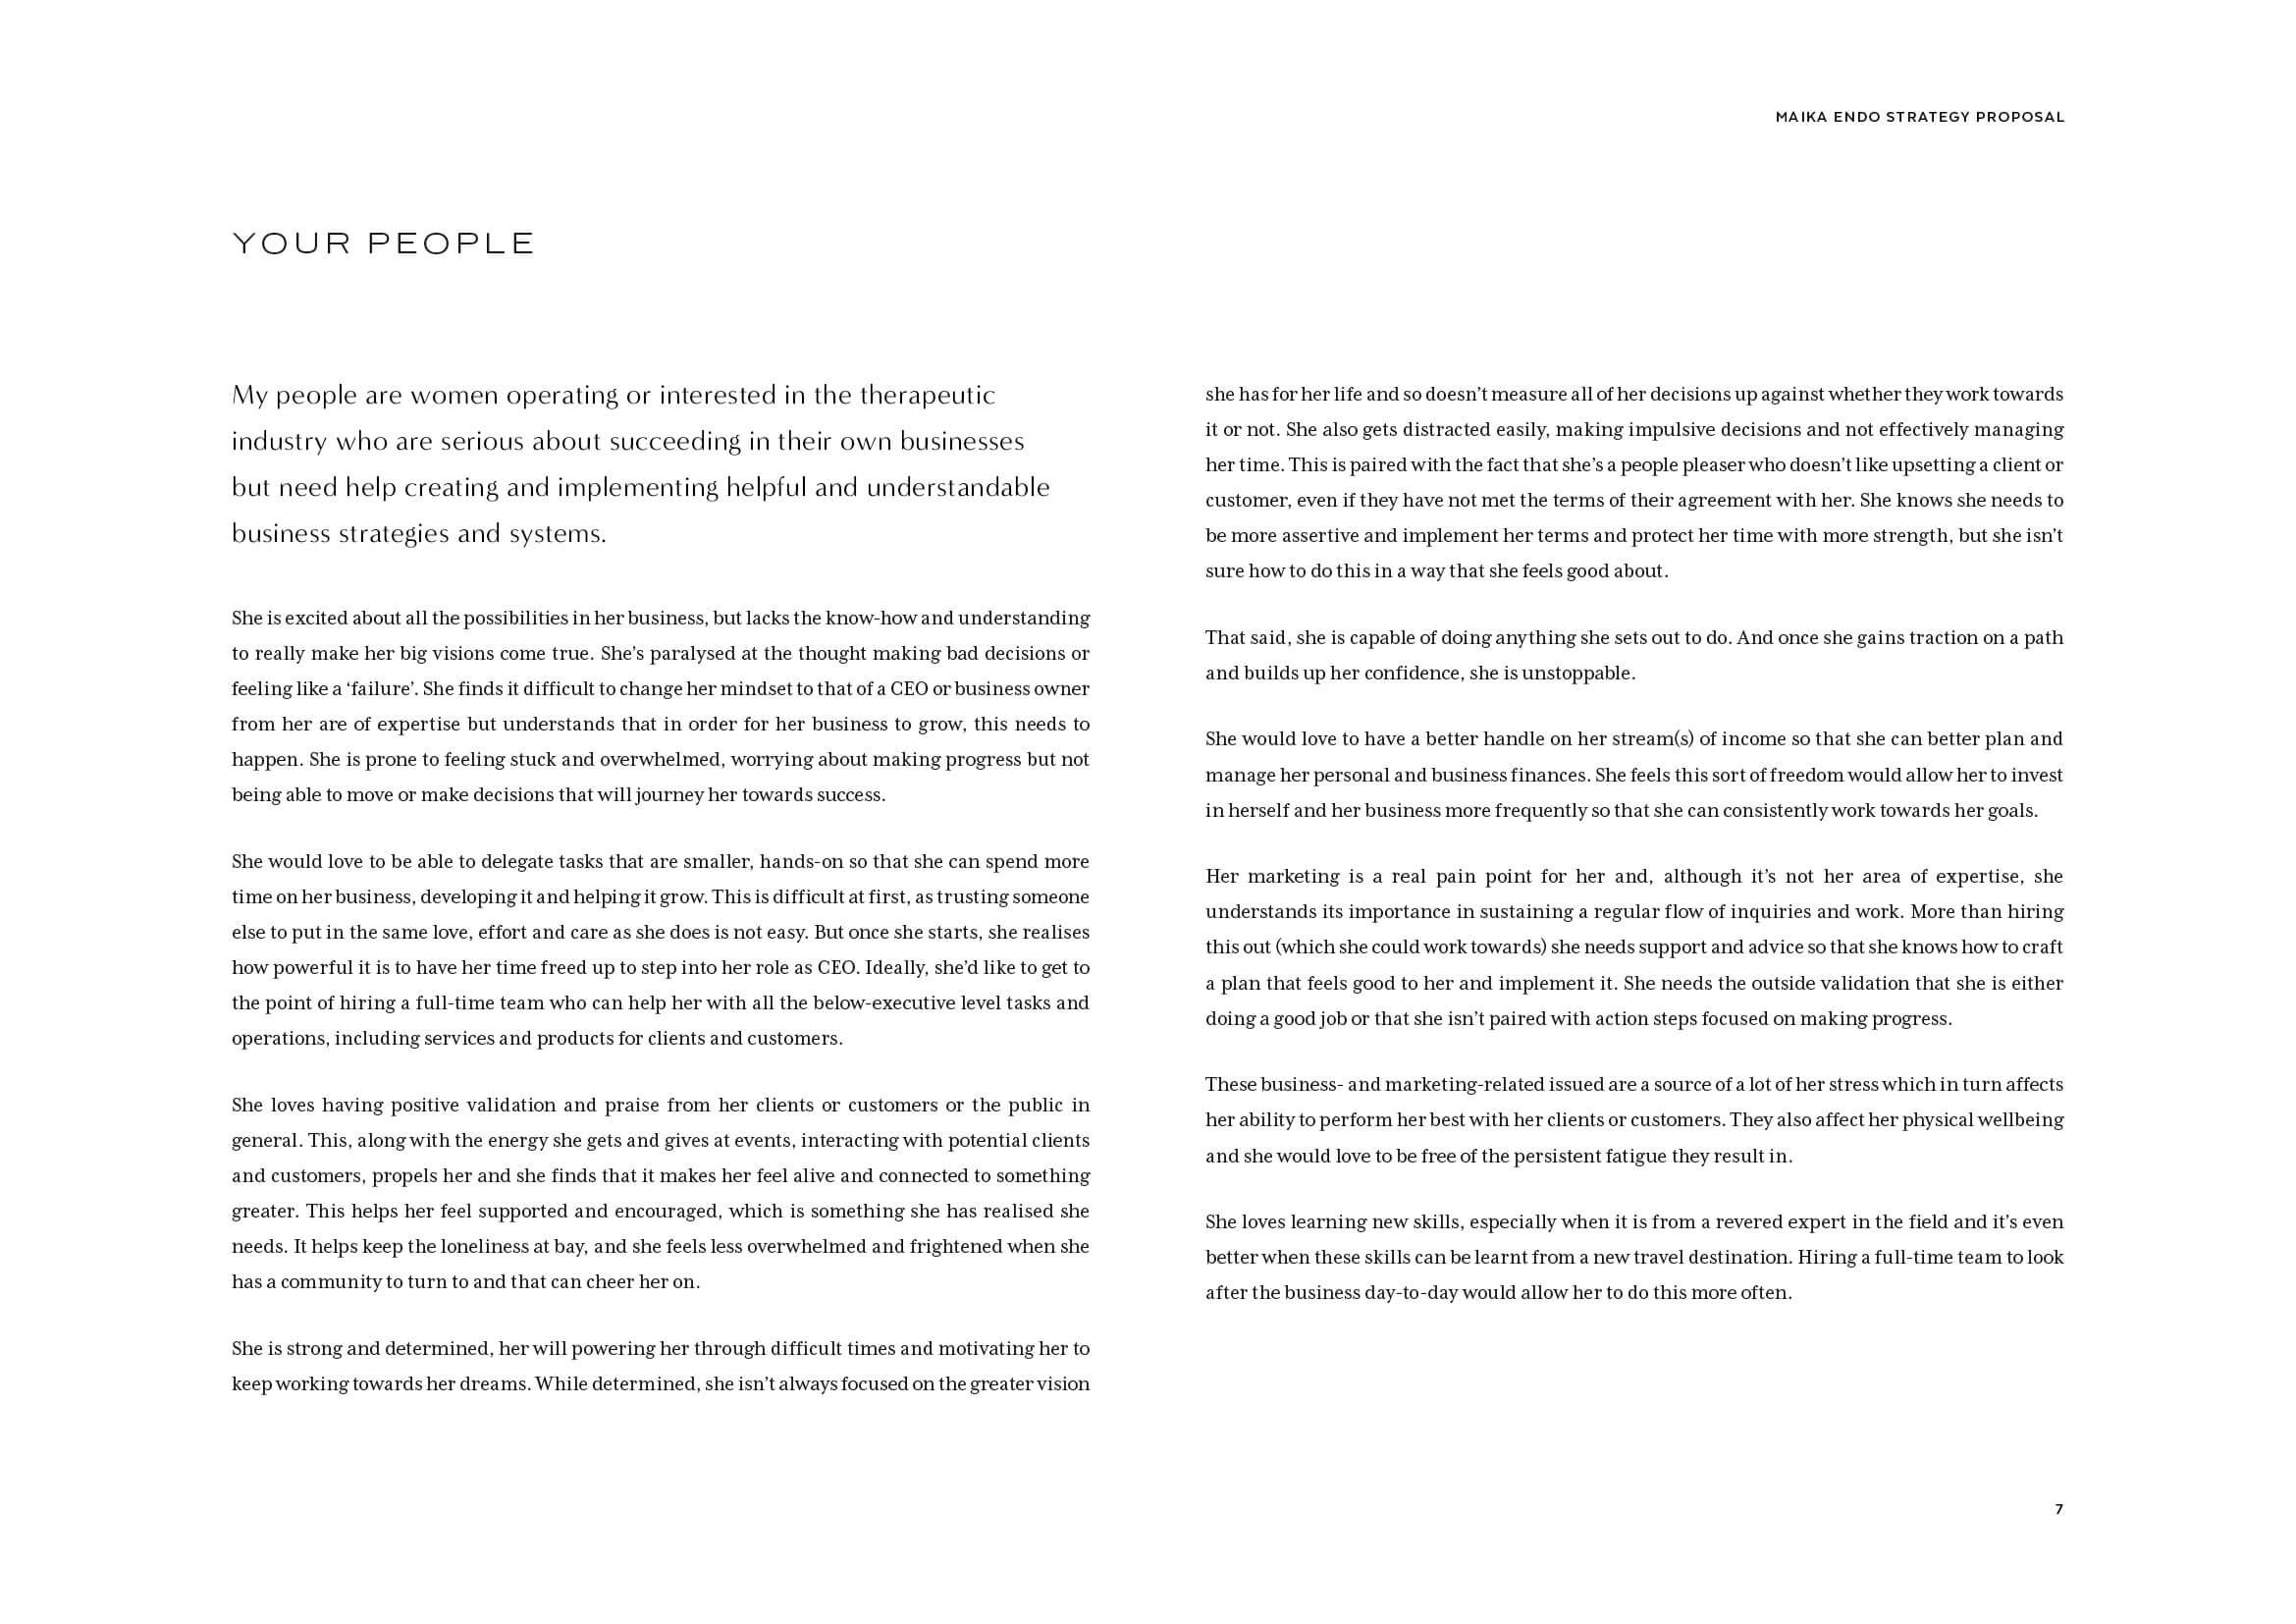 Maika Endo Strategy Proposal7.jpg